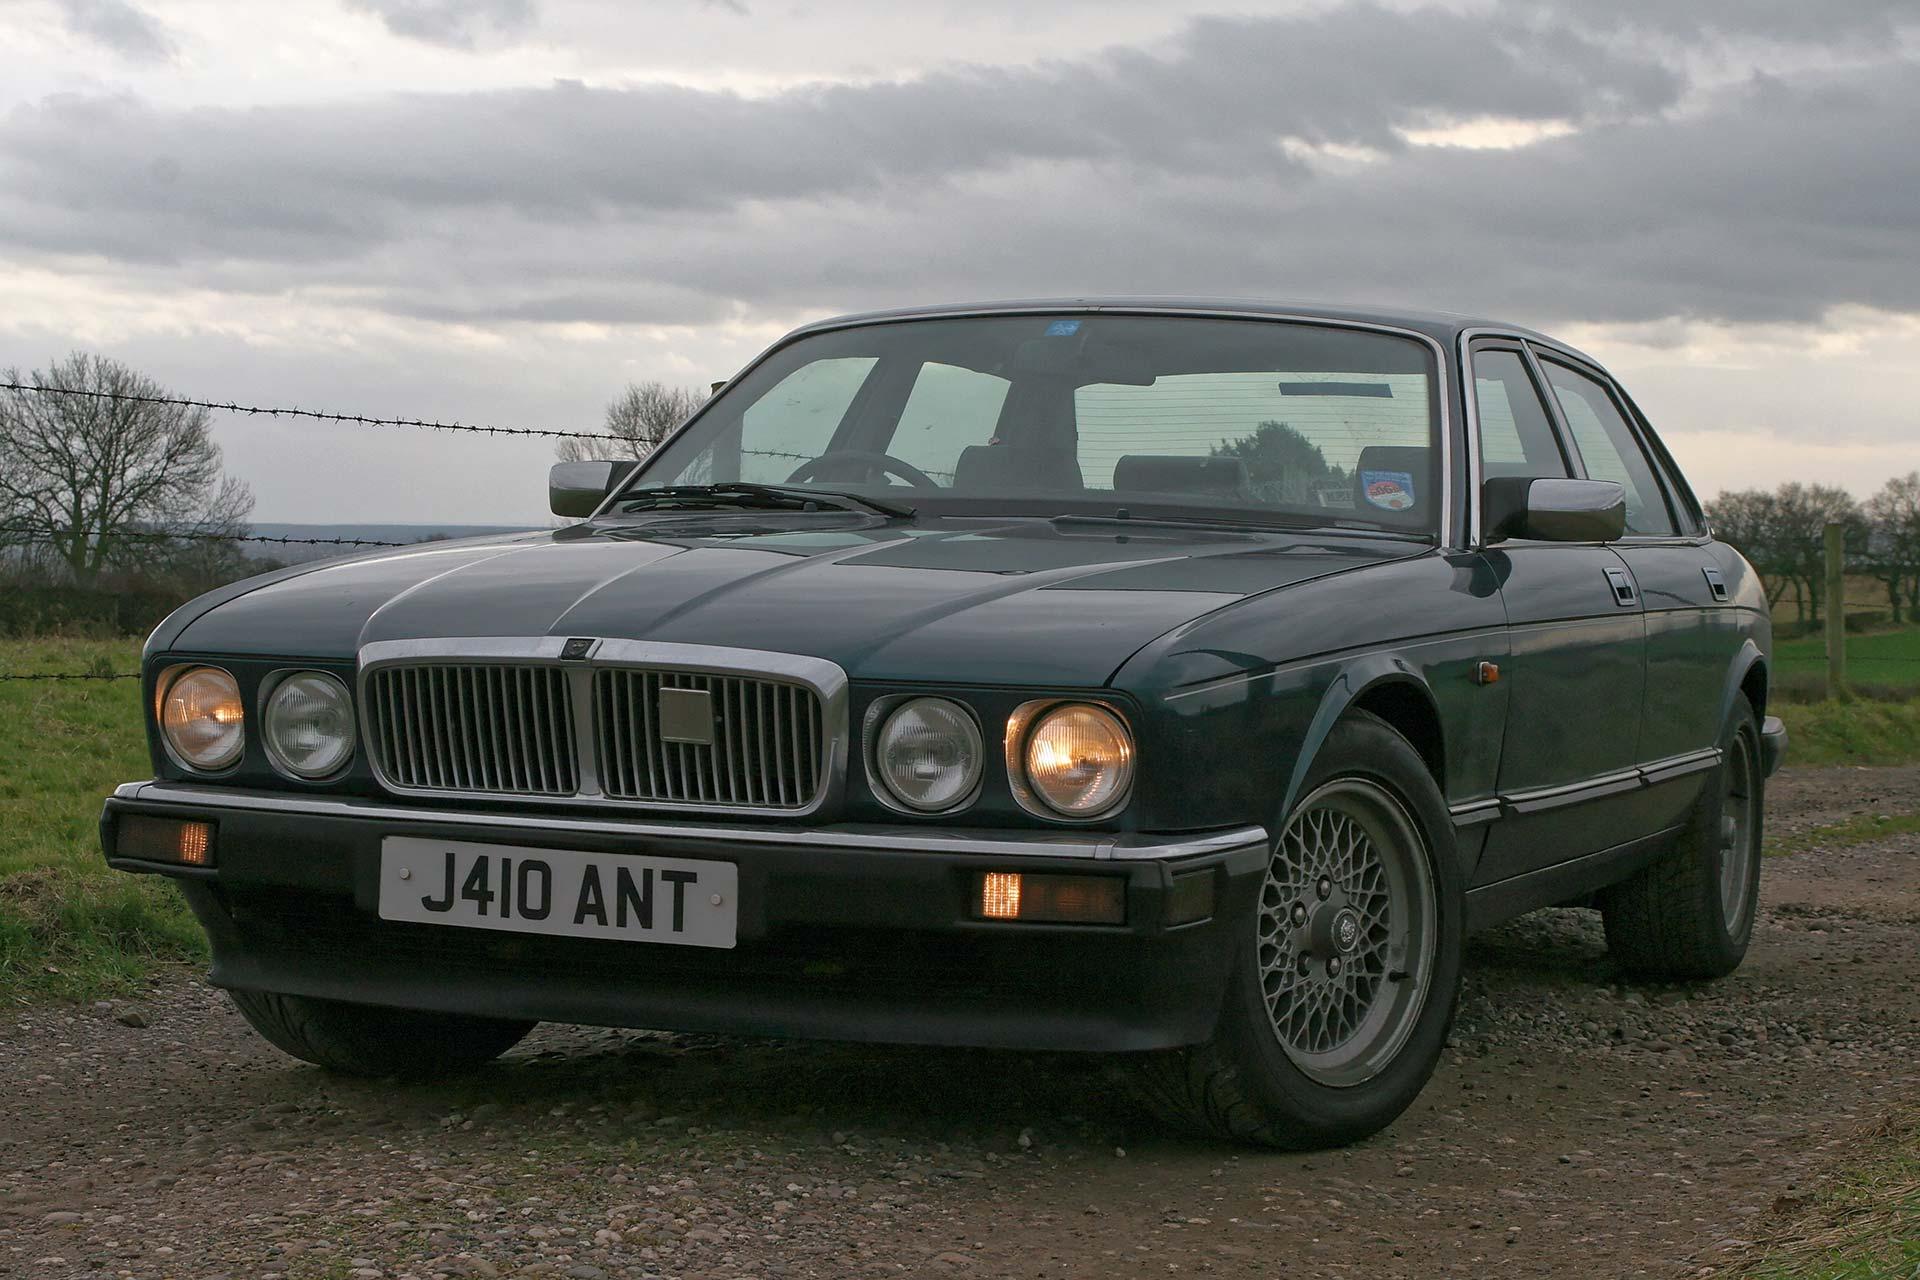 1991 Jaguar XJ6 (XJ40) - mp.net/cars